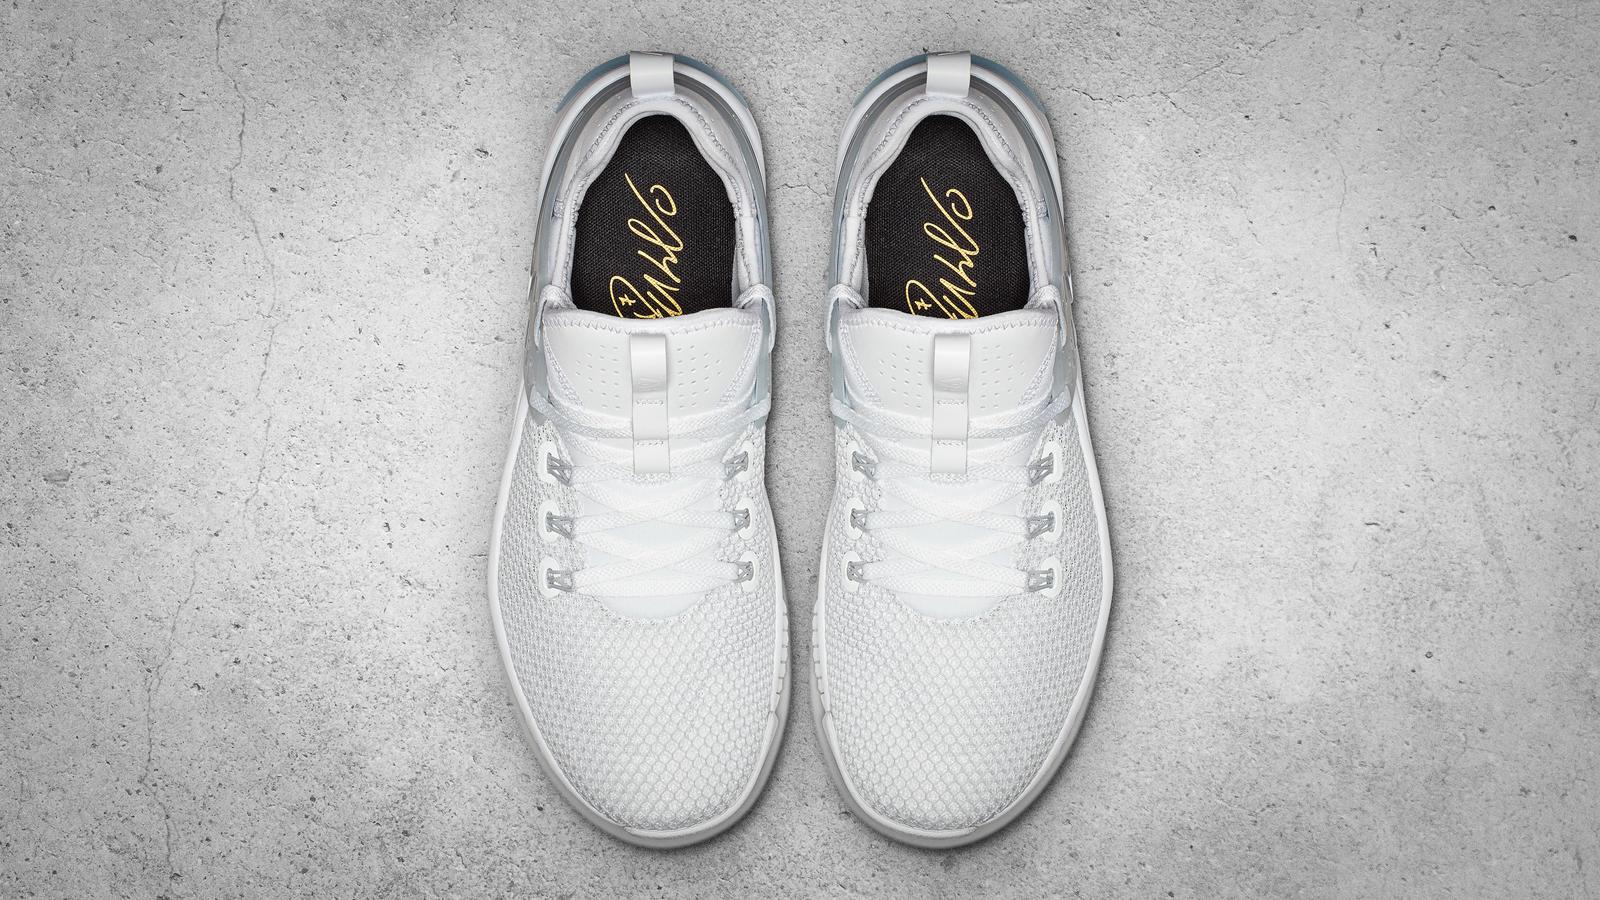 Cristiano Ronaldo's Nike Free CR7 x Metcon | HYPEBEAST